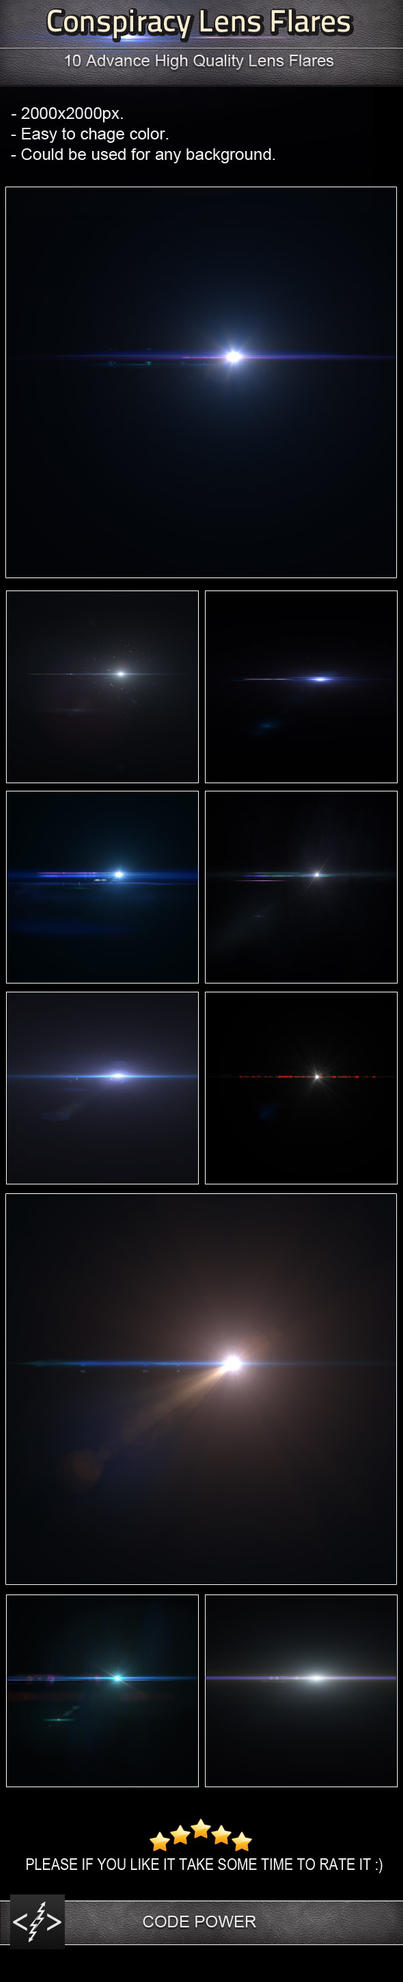 Conspiracy Lens Flares by khaledzz9